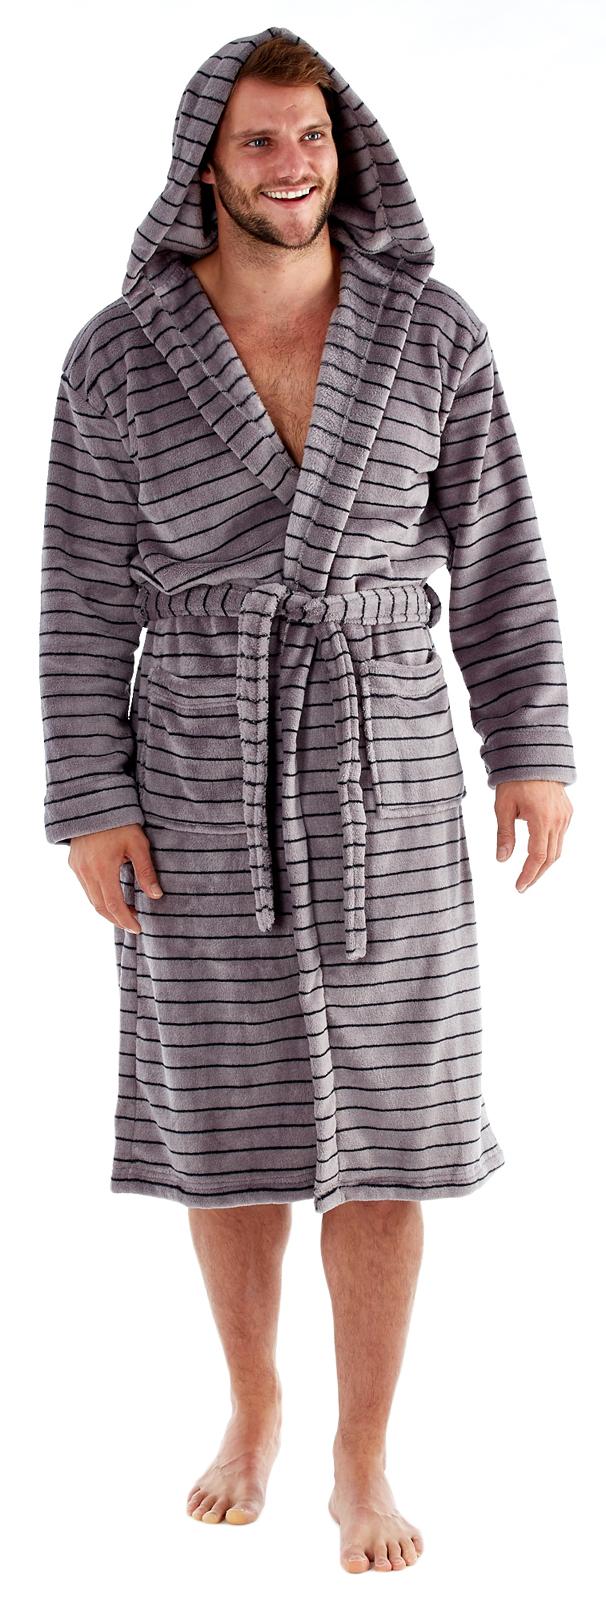 Mens Luxury Dressing Gowns Fleece Bath Robes House Coat Robe + Belt ...